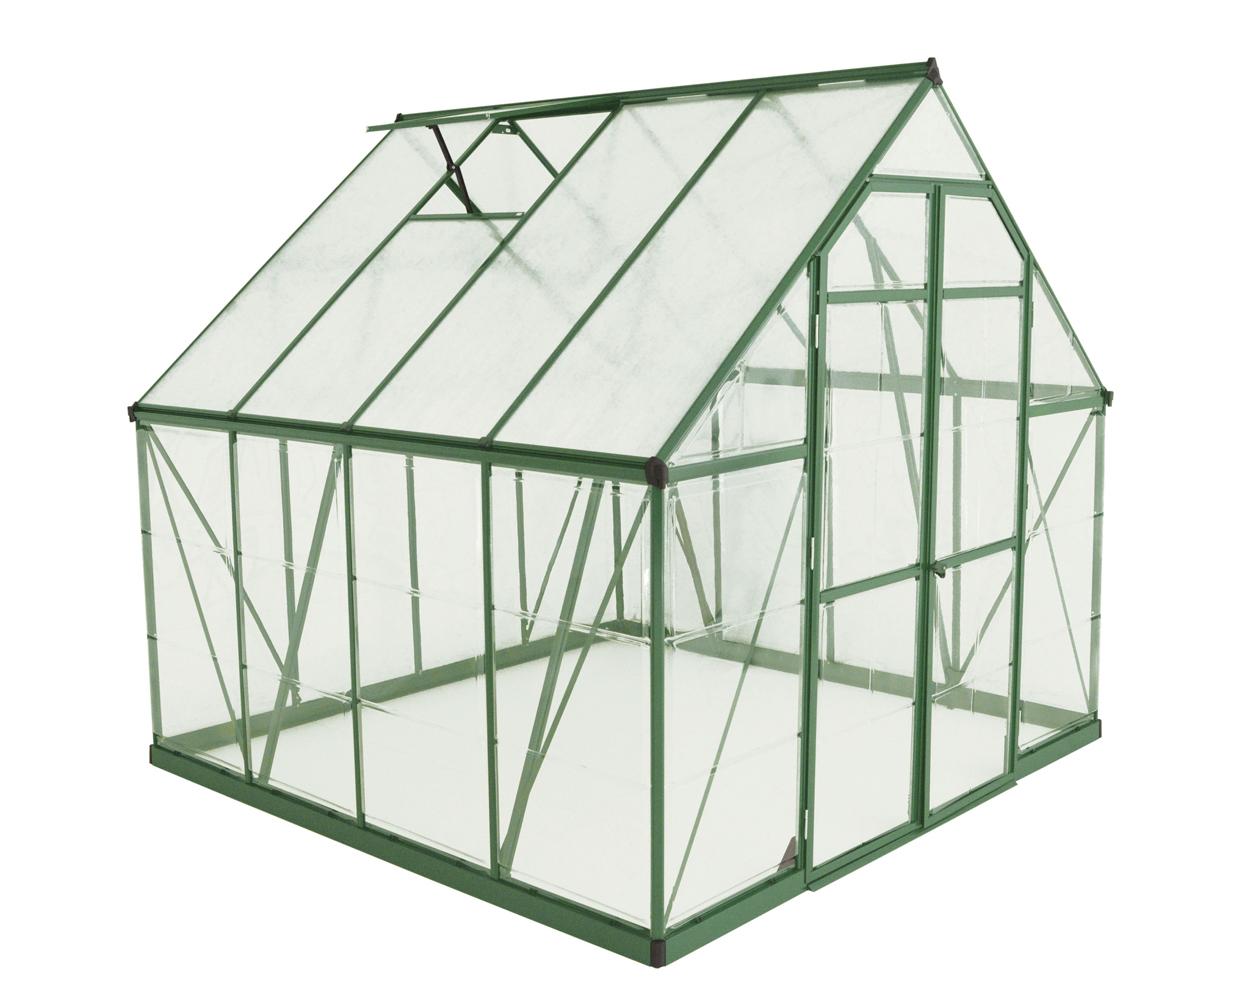 Balance 8' x 8' Greenhouse